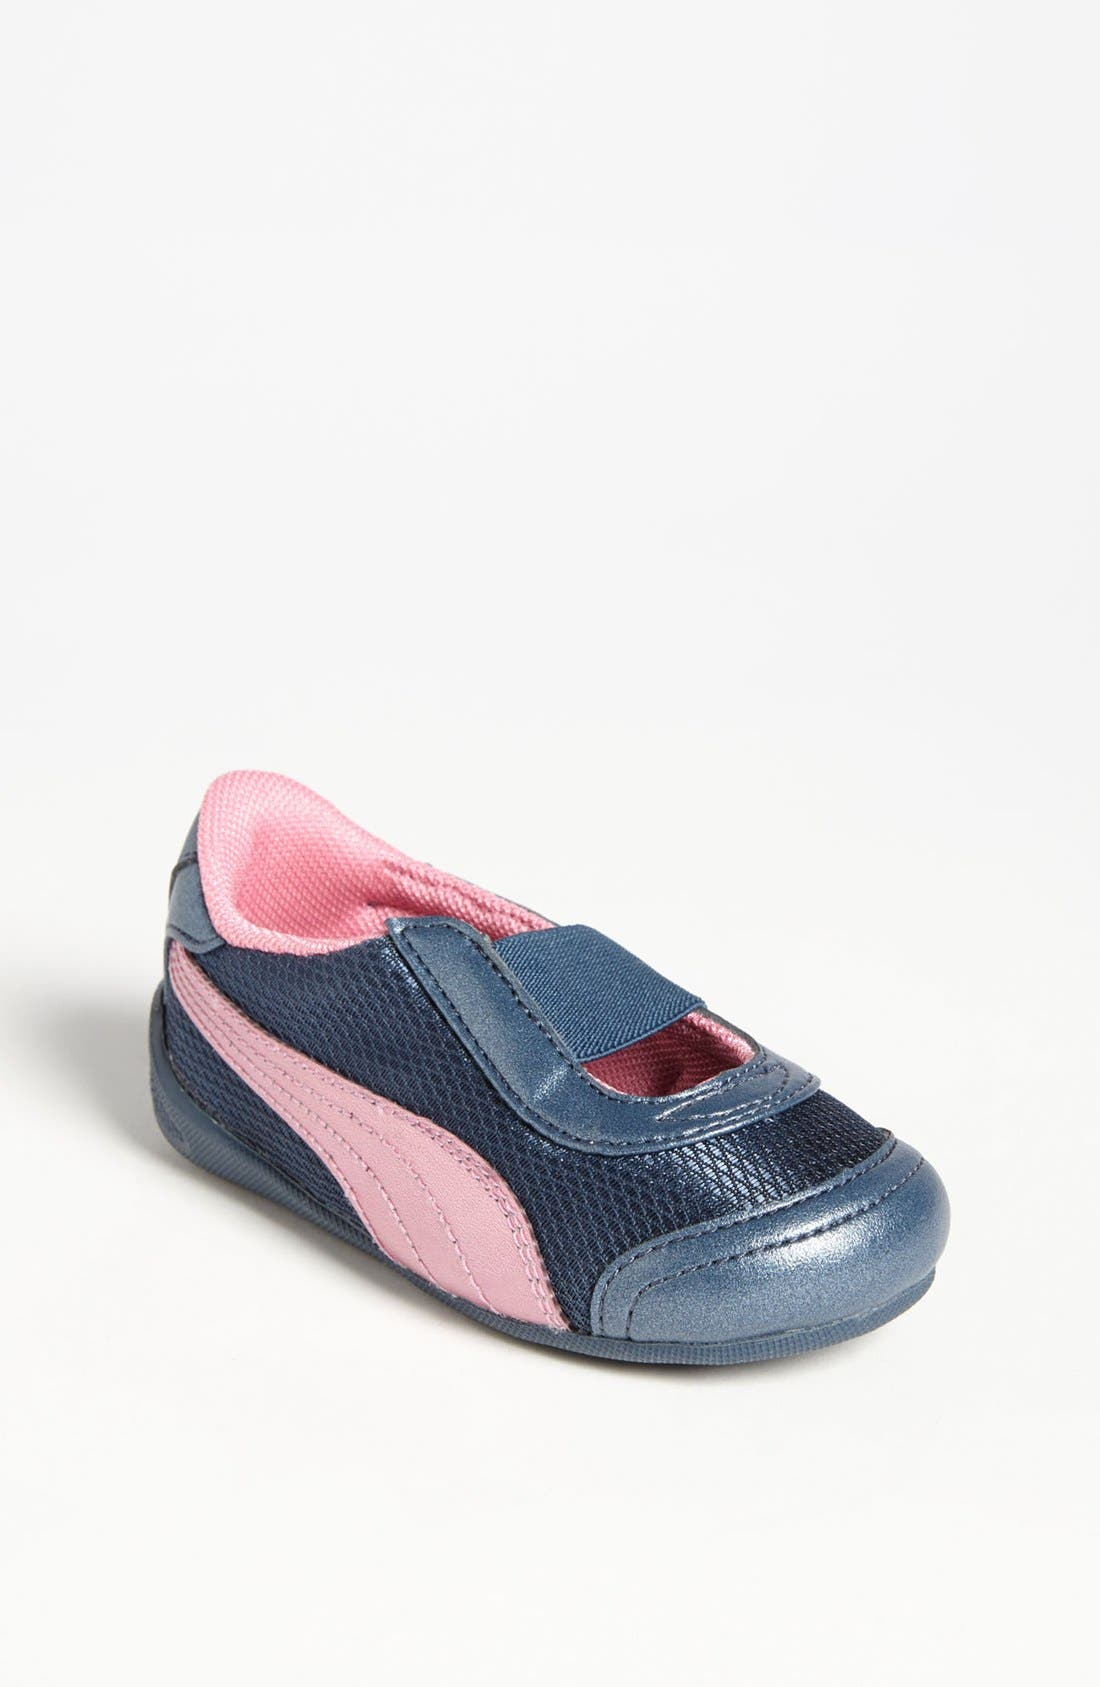 Alternate Image 1 Selected - PUMA 'Sneakerina' Slip-On (Walker, Toddler & Little Kid)(Nordstrom Exclusive)